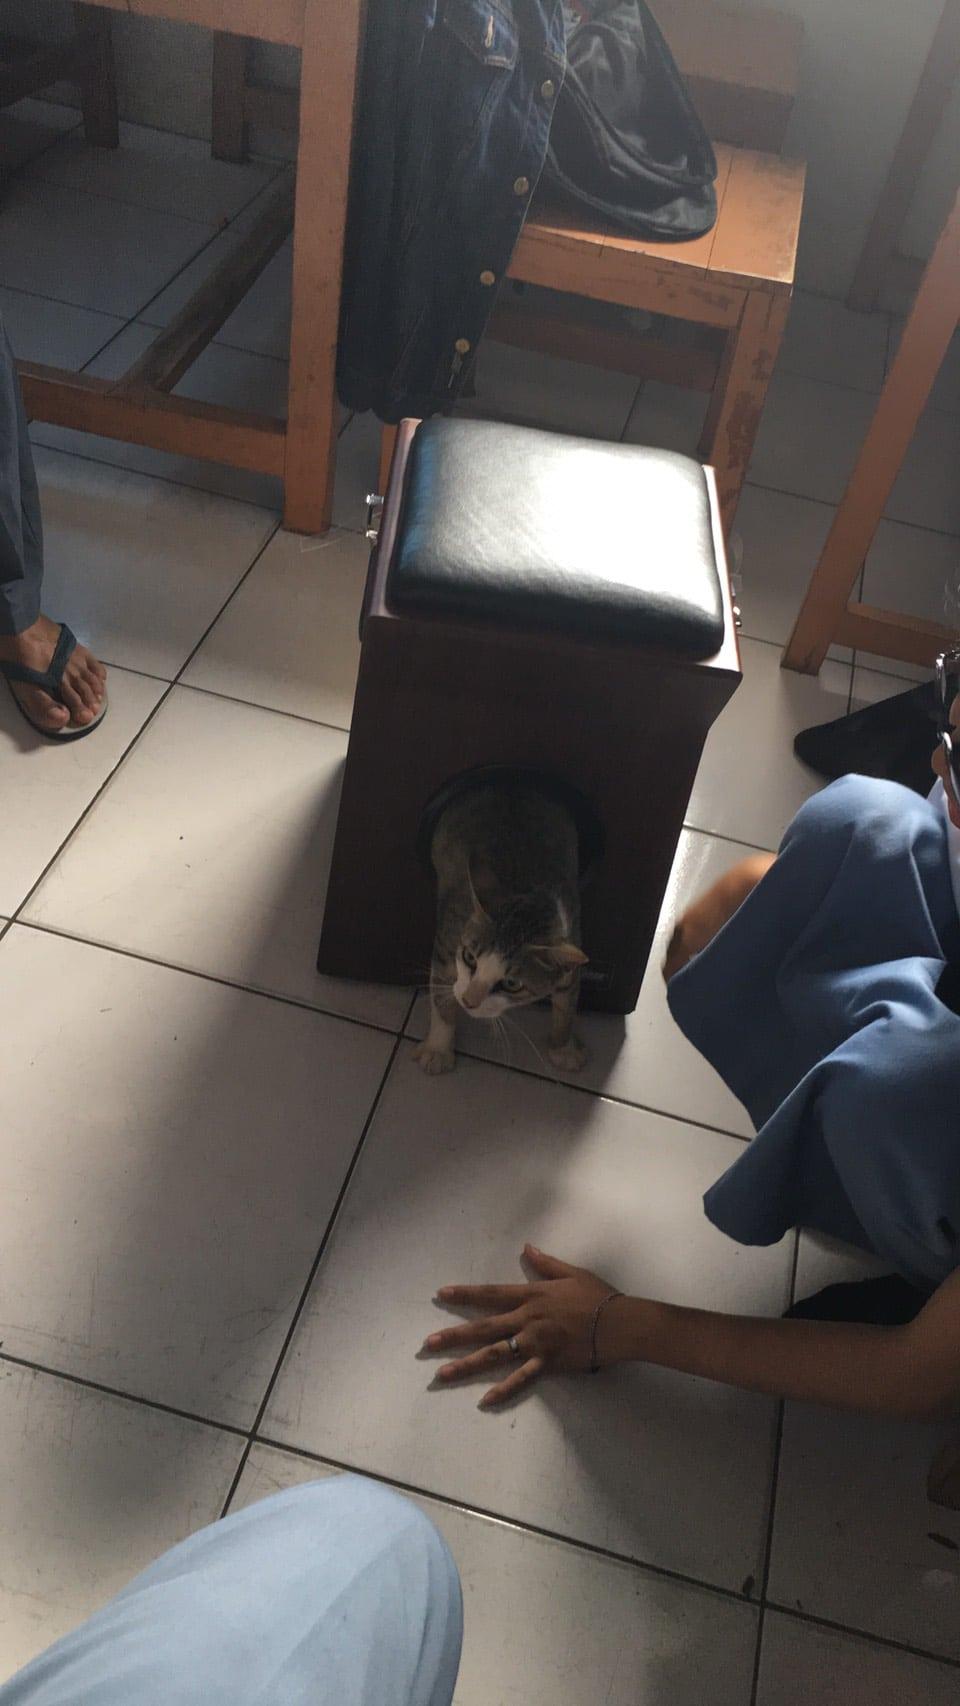 [VIDEO] Gabra Kucing Bunting Tersangkut Dalam Lubang, 1 Kelas Gigih Selamatkan